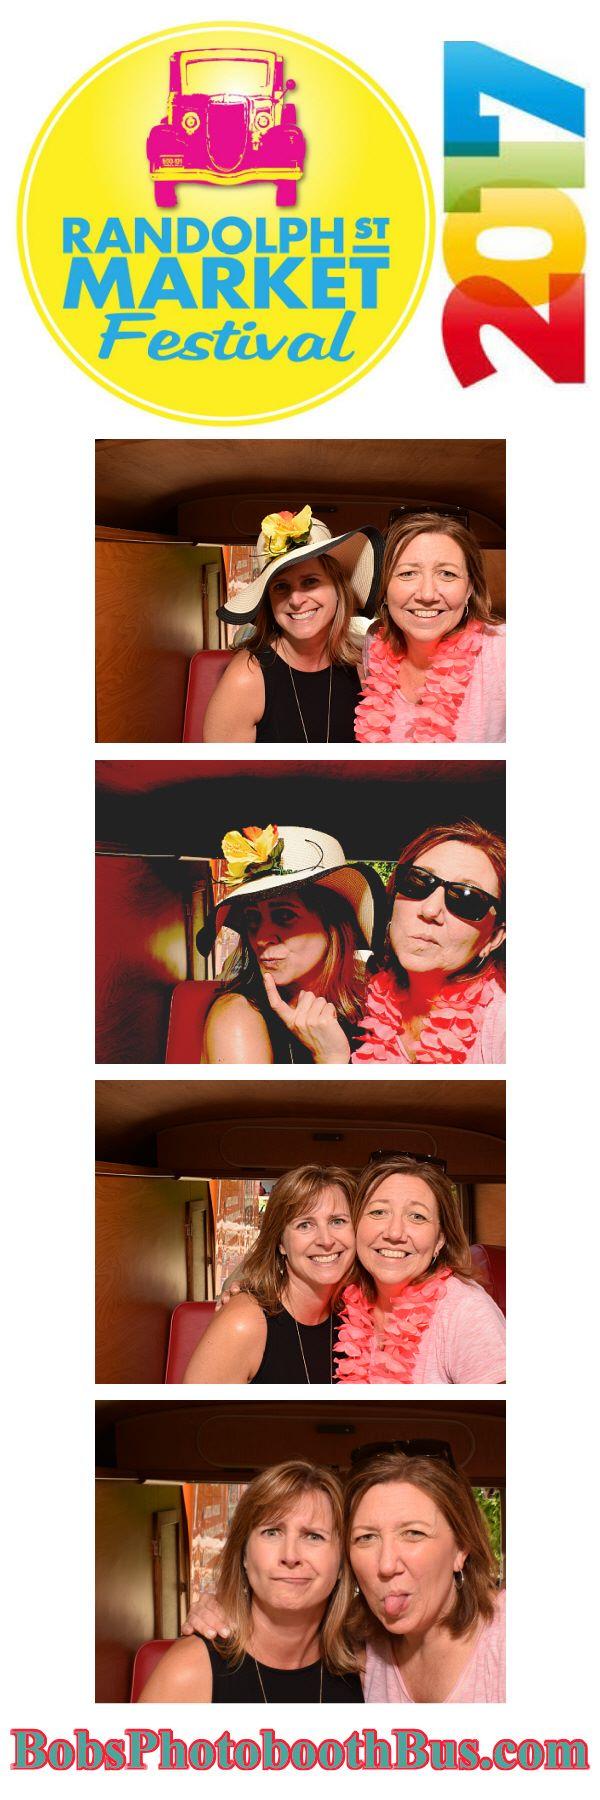 Jamee & Kerry Photobooth Photo's.jpg